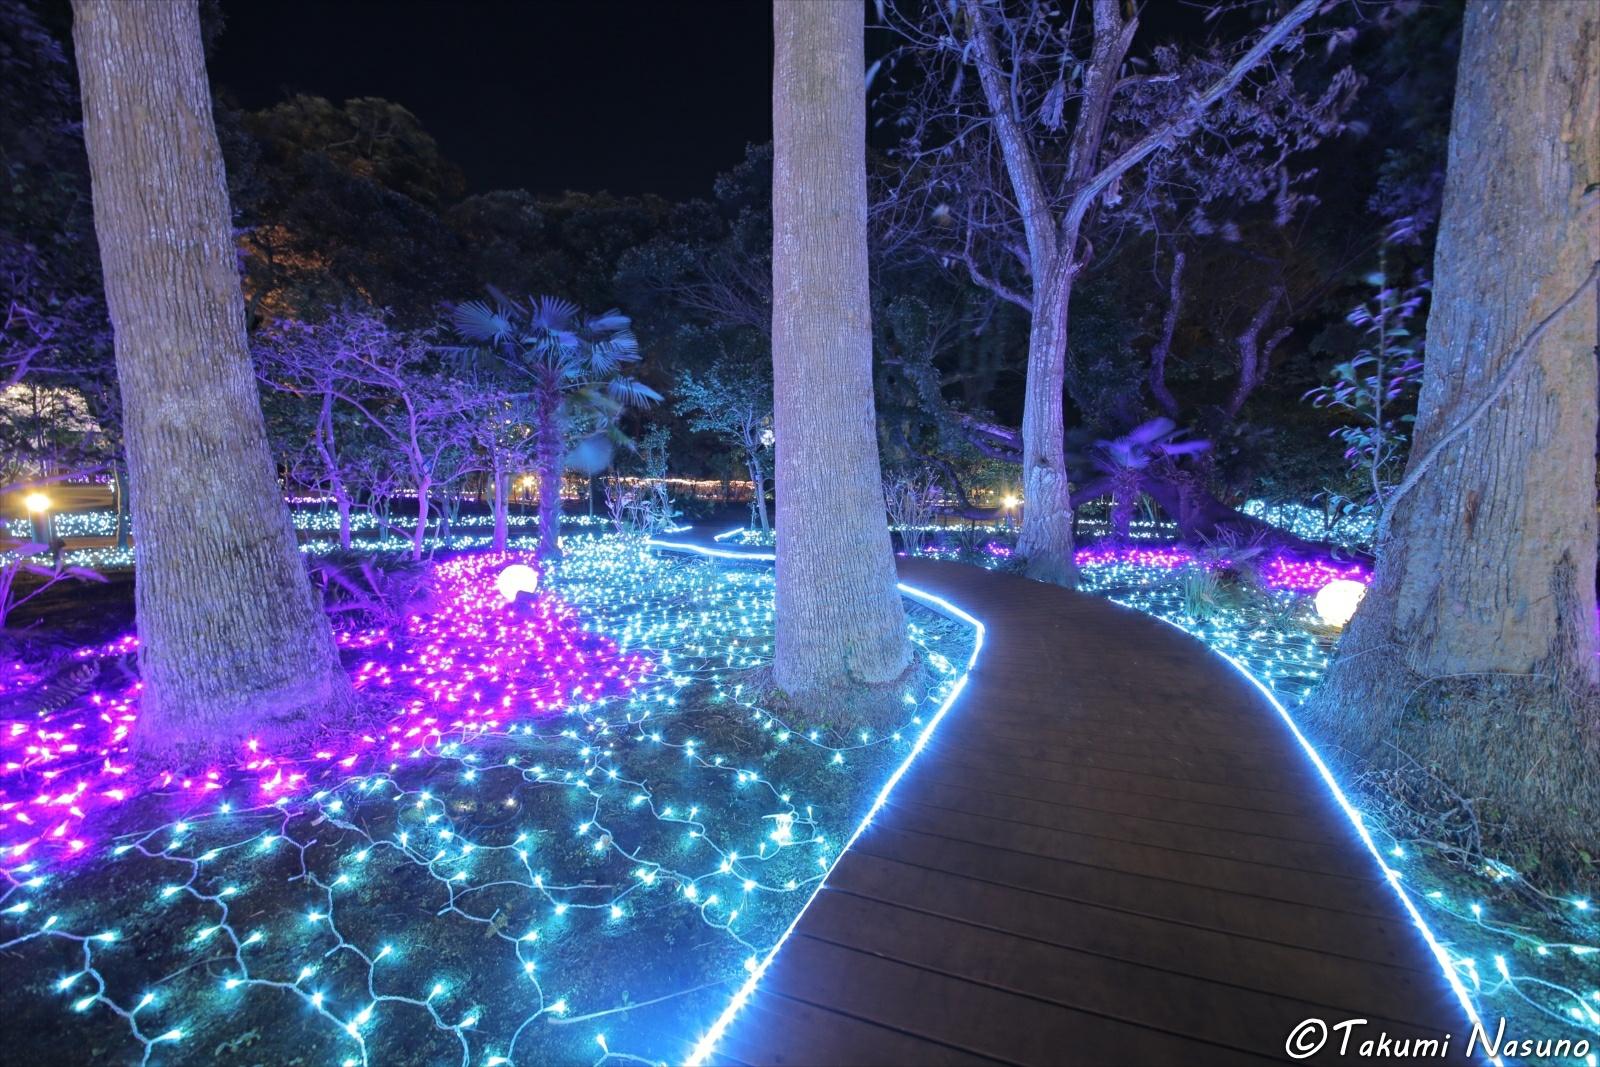 Illumination Road of Enoshima Island